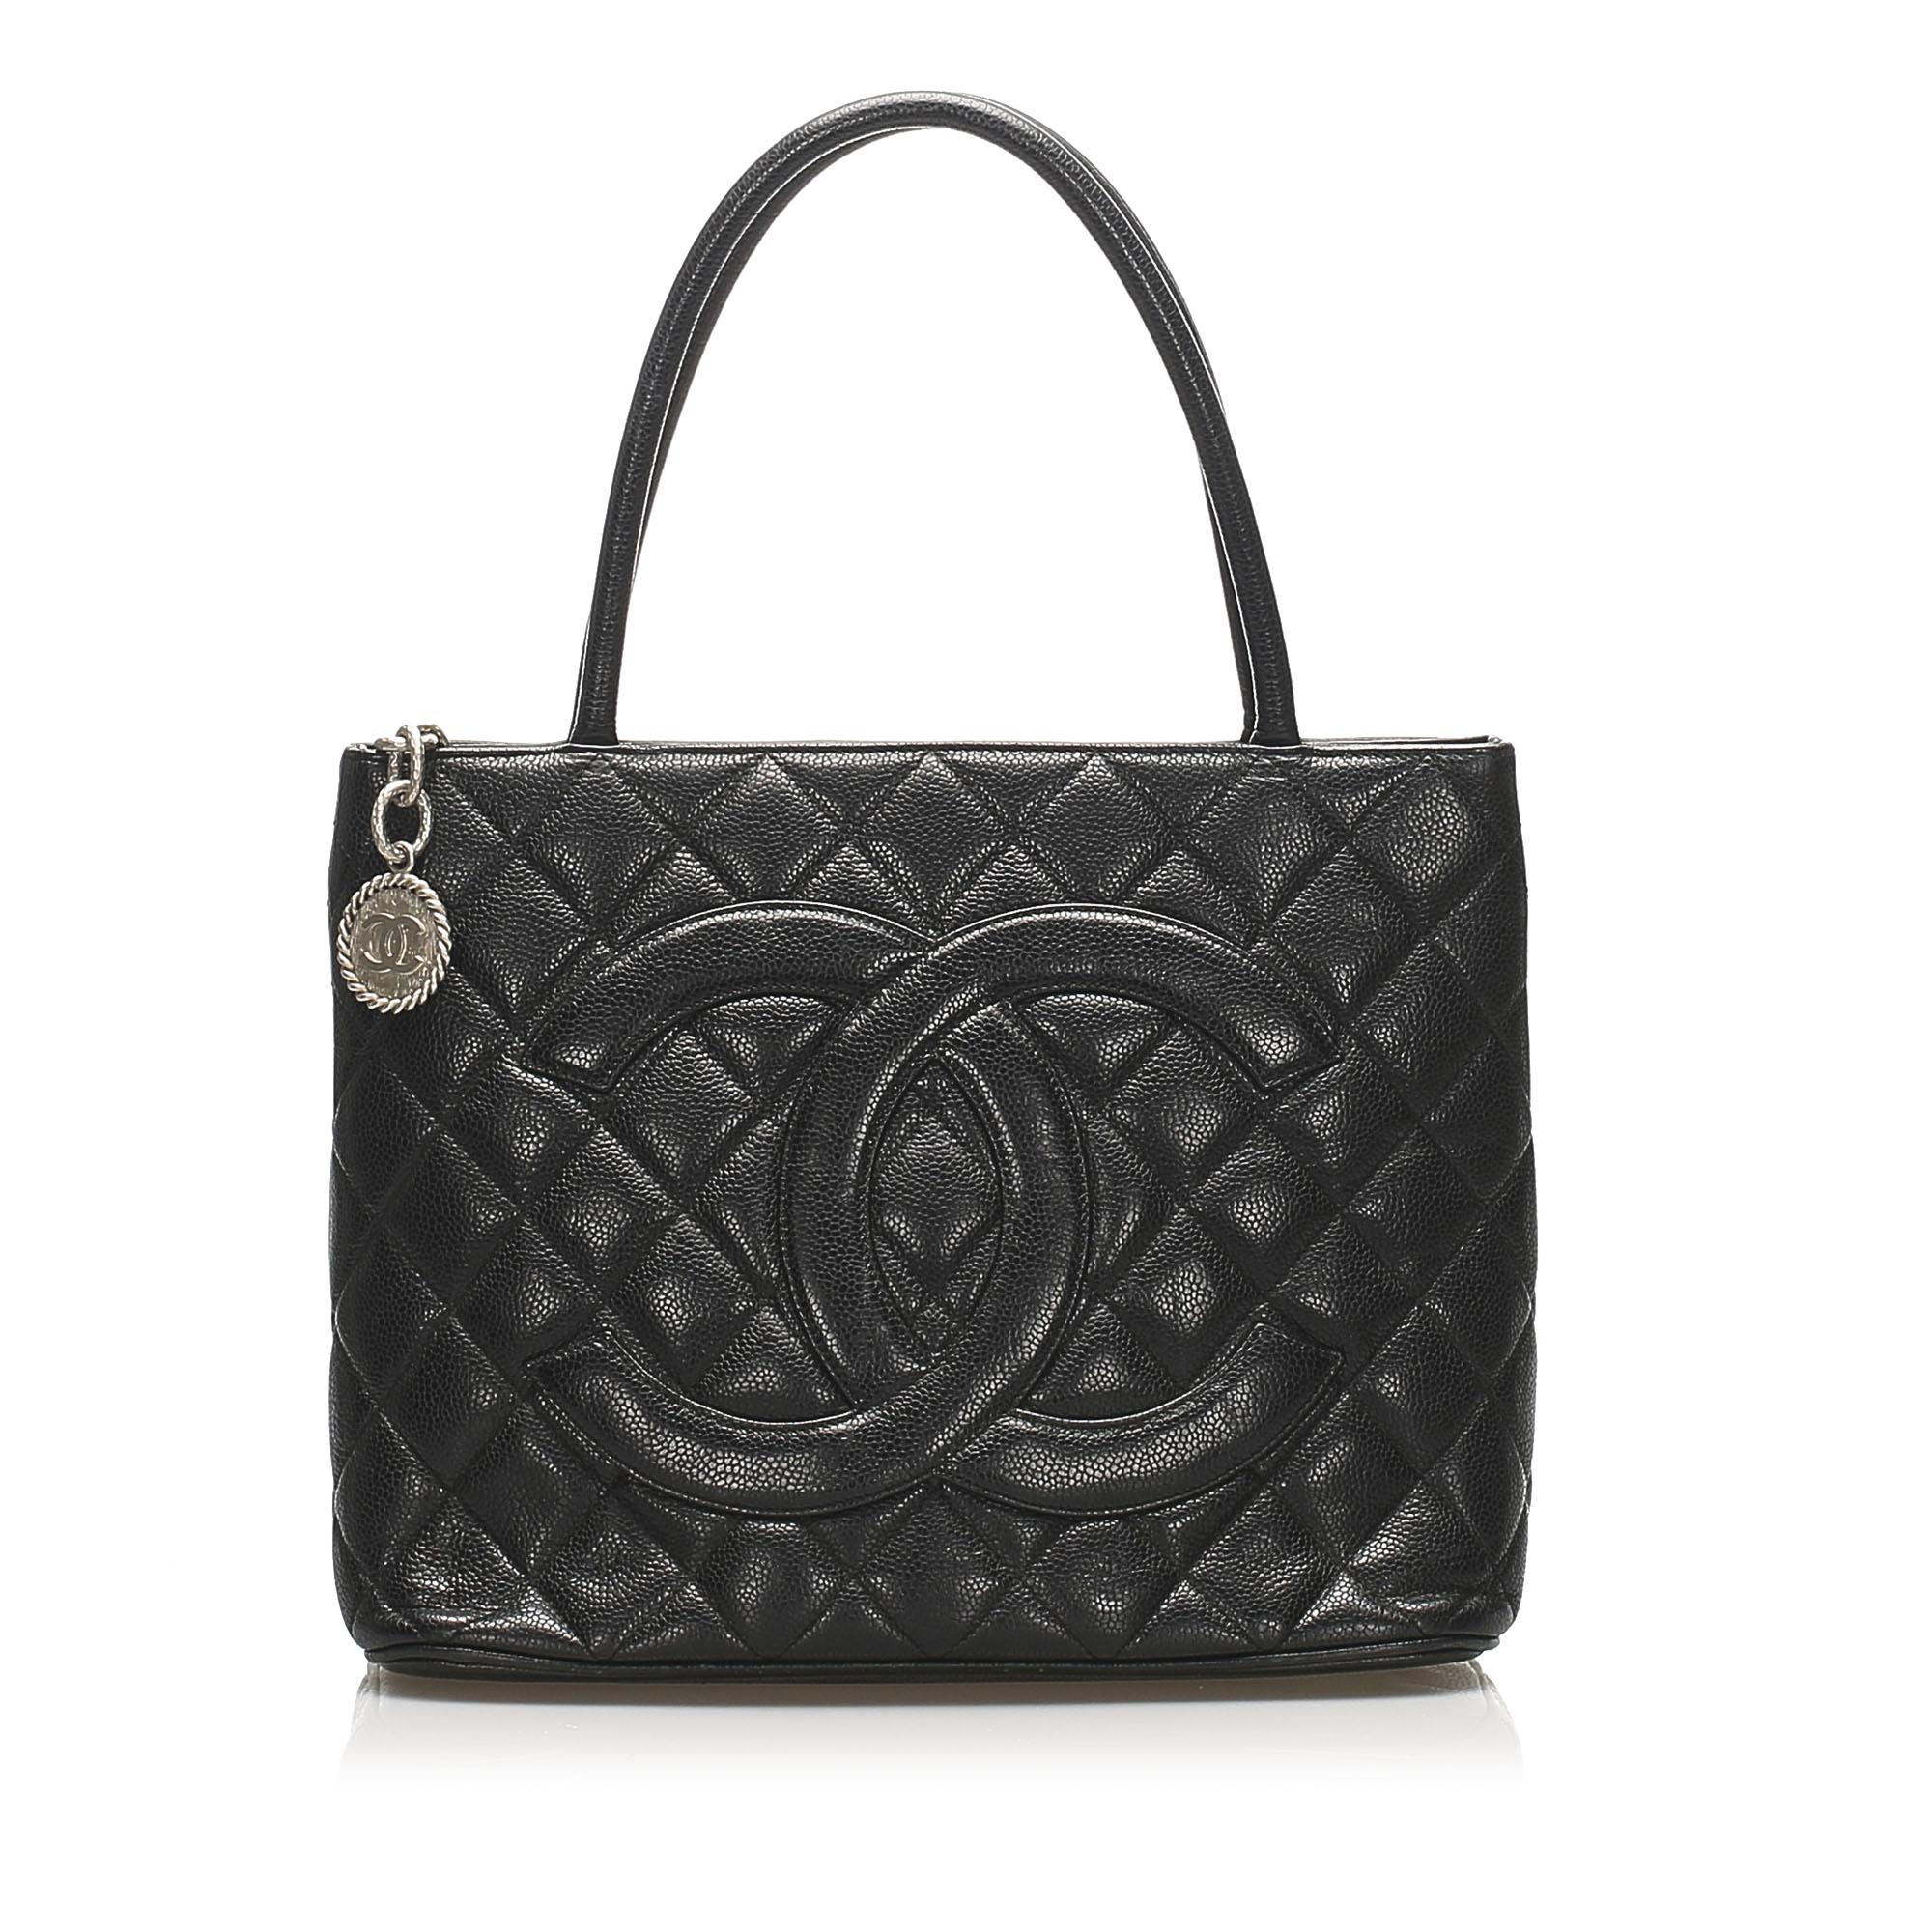 Chanel Medallion Caviar Leather Tote Bag